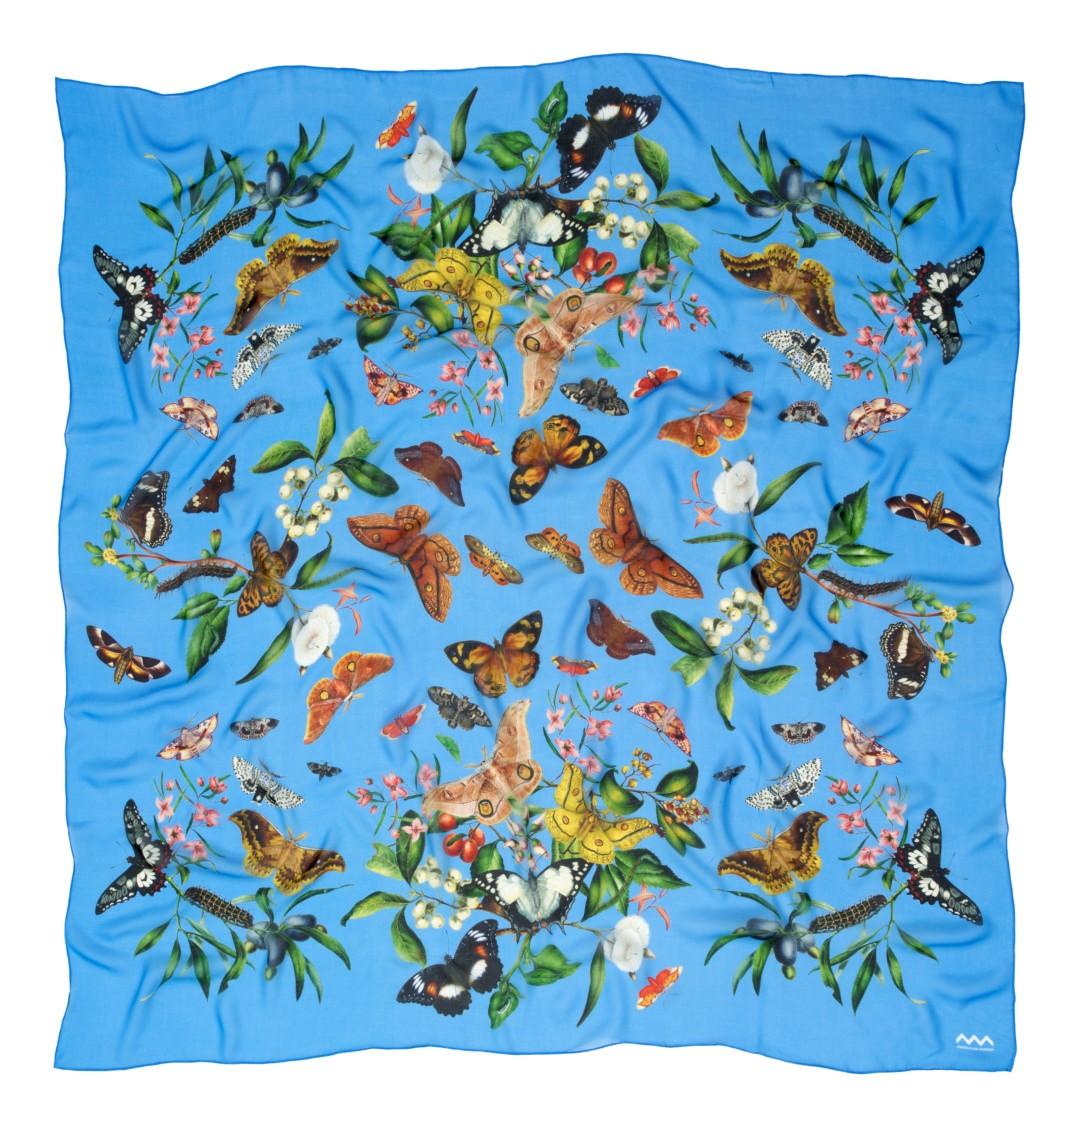 Scott Sister Specimen Drawing silk scarf in blue for the Australian Museum